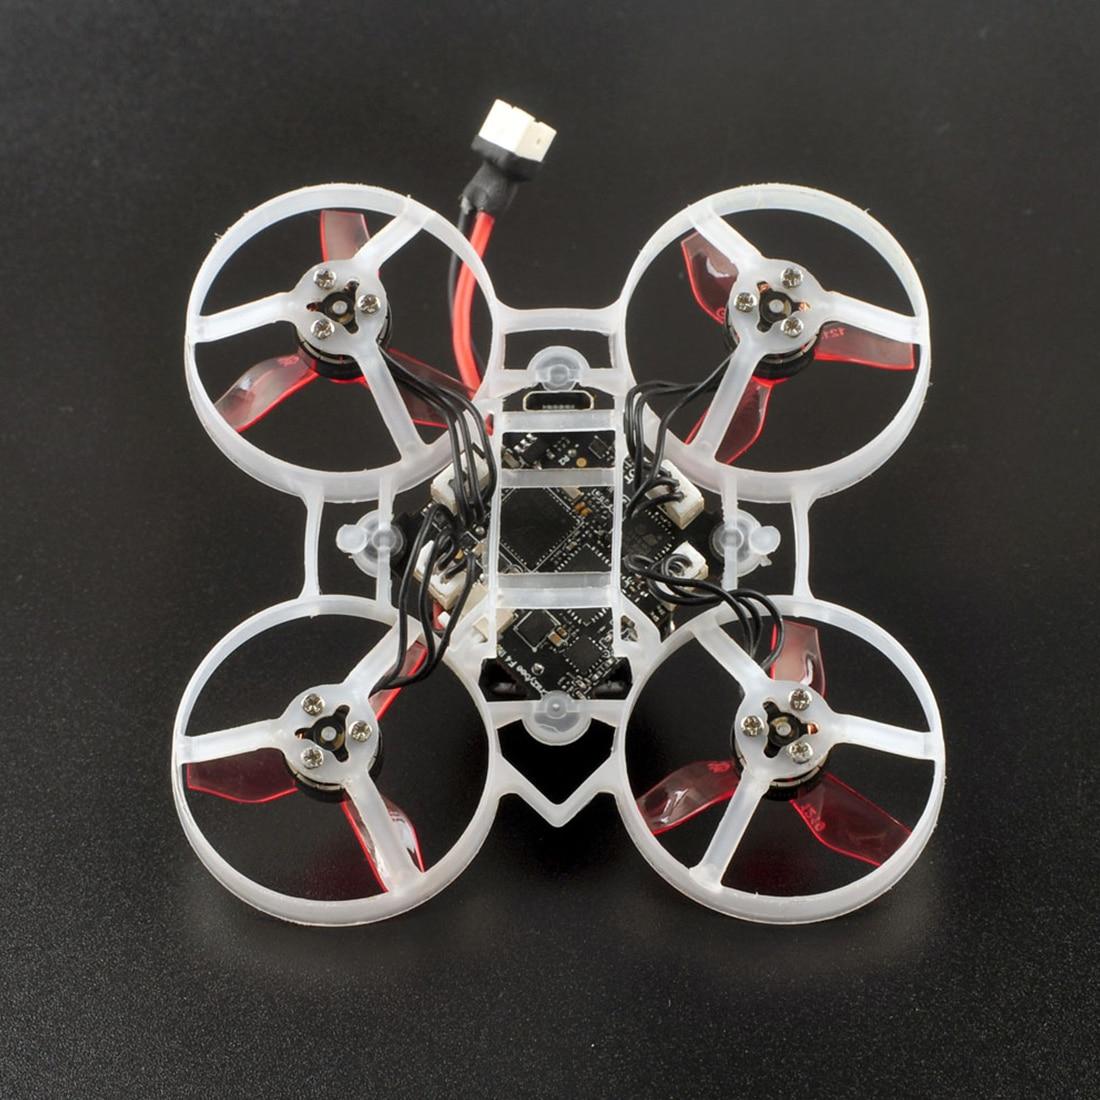 Happymodel Mobula6 Mobula 6 1S 65 Mm Borstelloze Bwhoop Fpv Racing Drone Met 4in1 Crazybee F4 Lite Runcam Nano3 preorder Rc Dron 4